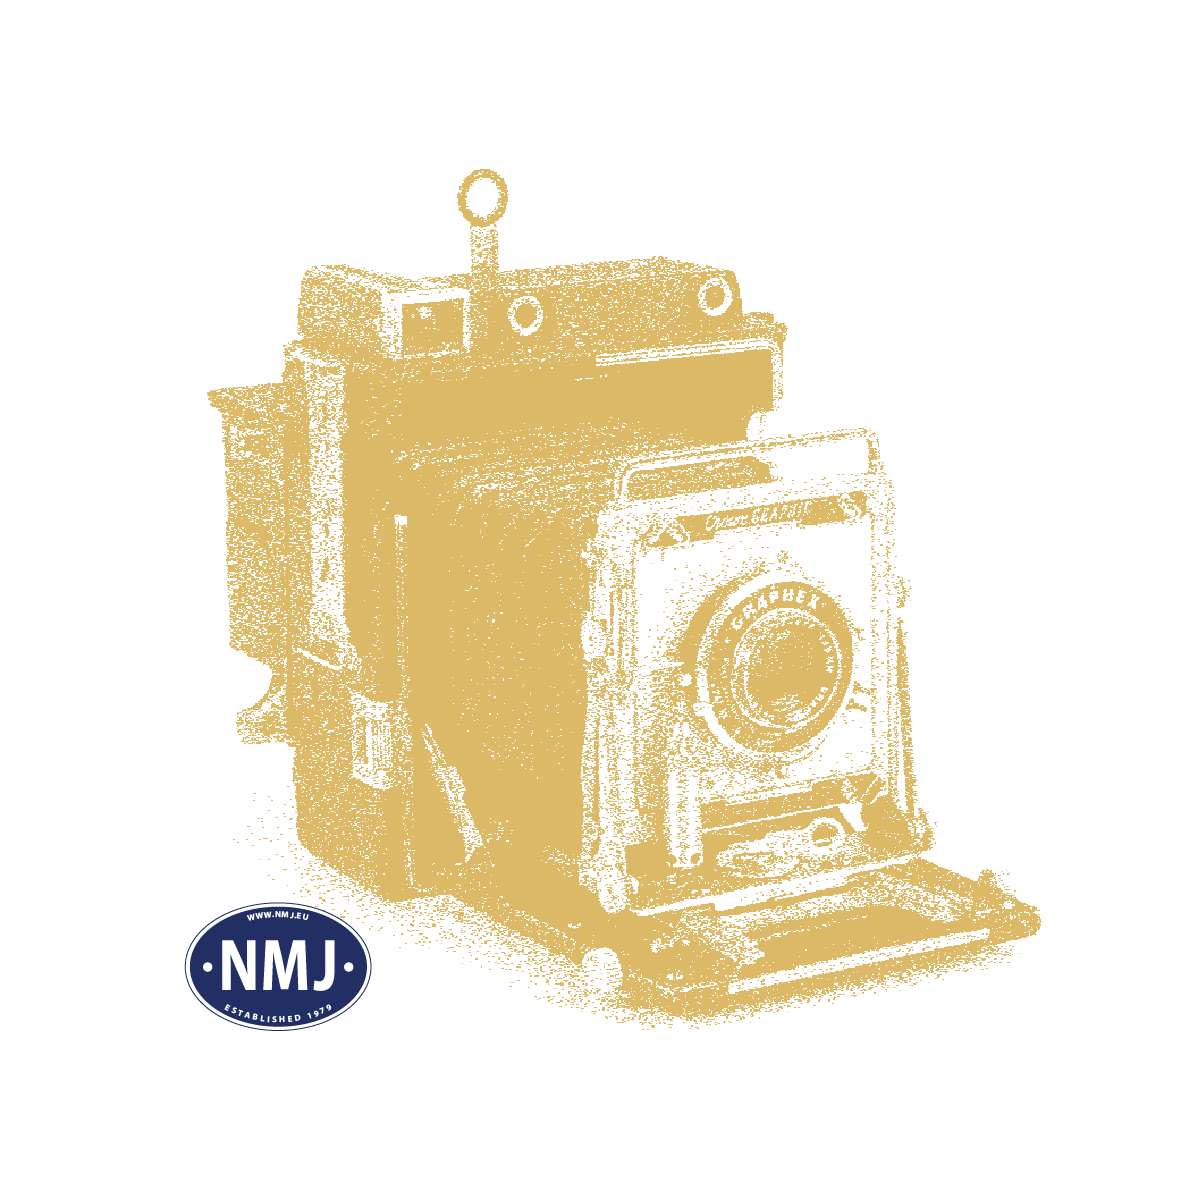 NMJT90303 - NMJ Topline CFL 1604 (1971 -->), DC